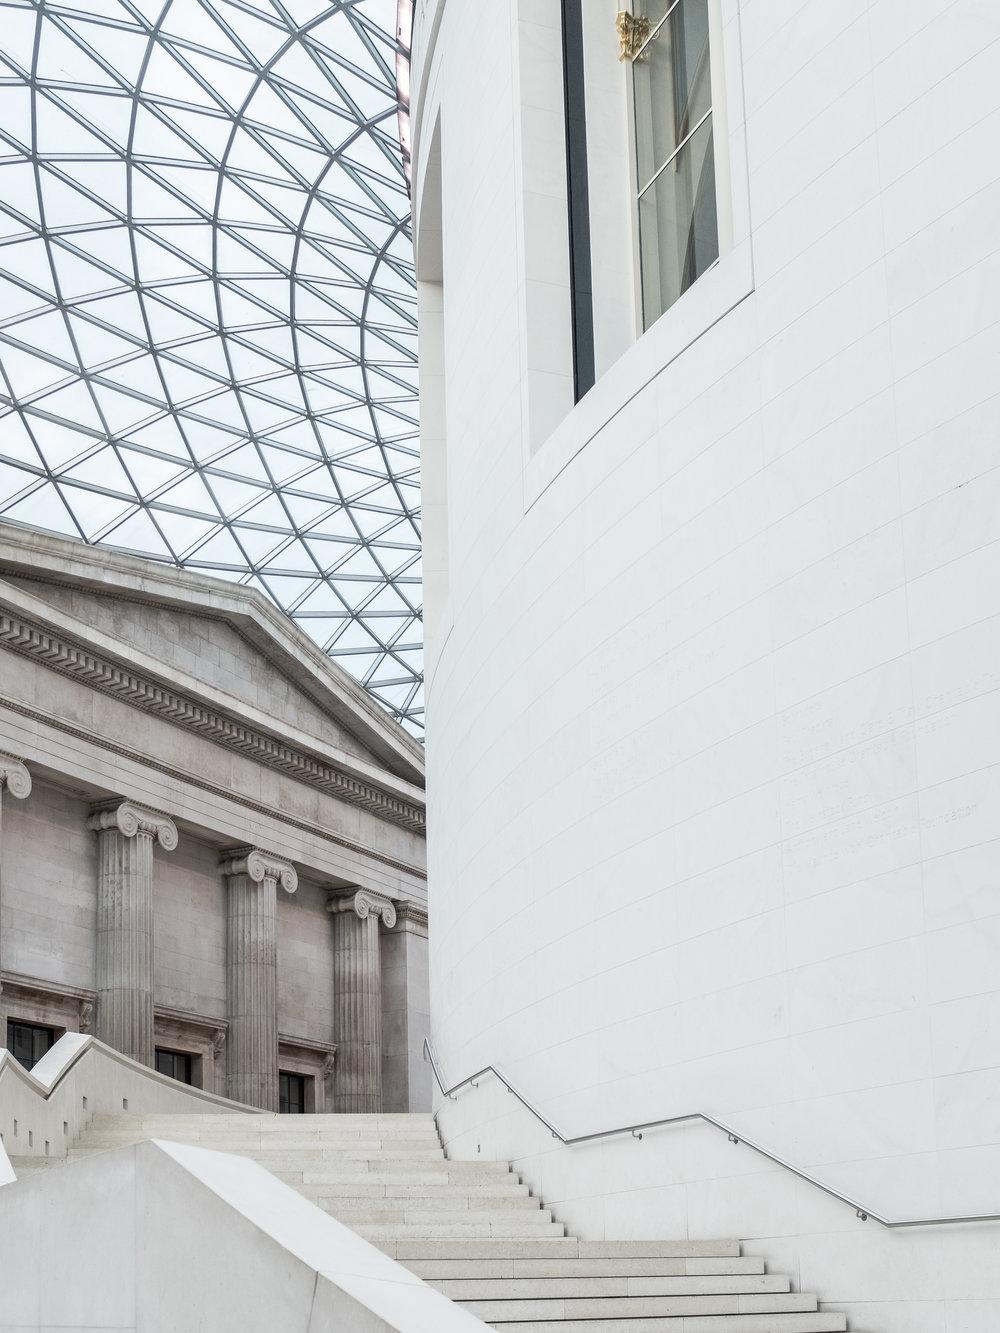 British Museum by Handover-6.jpg